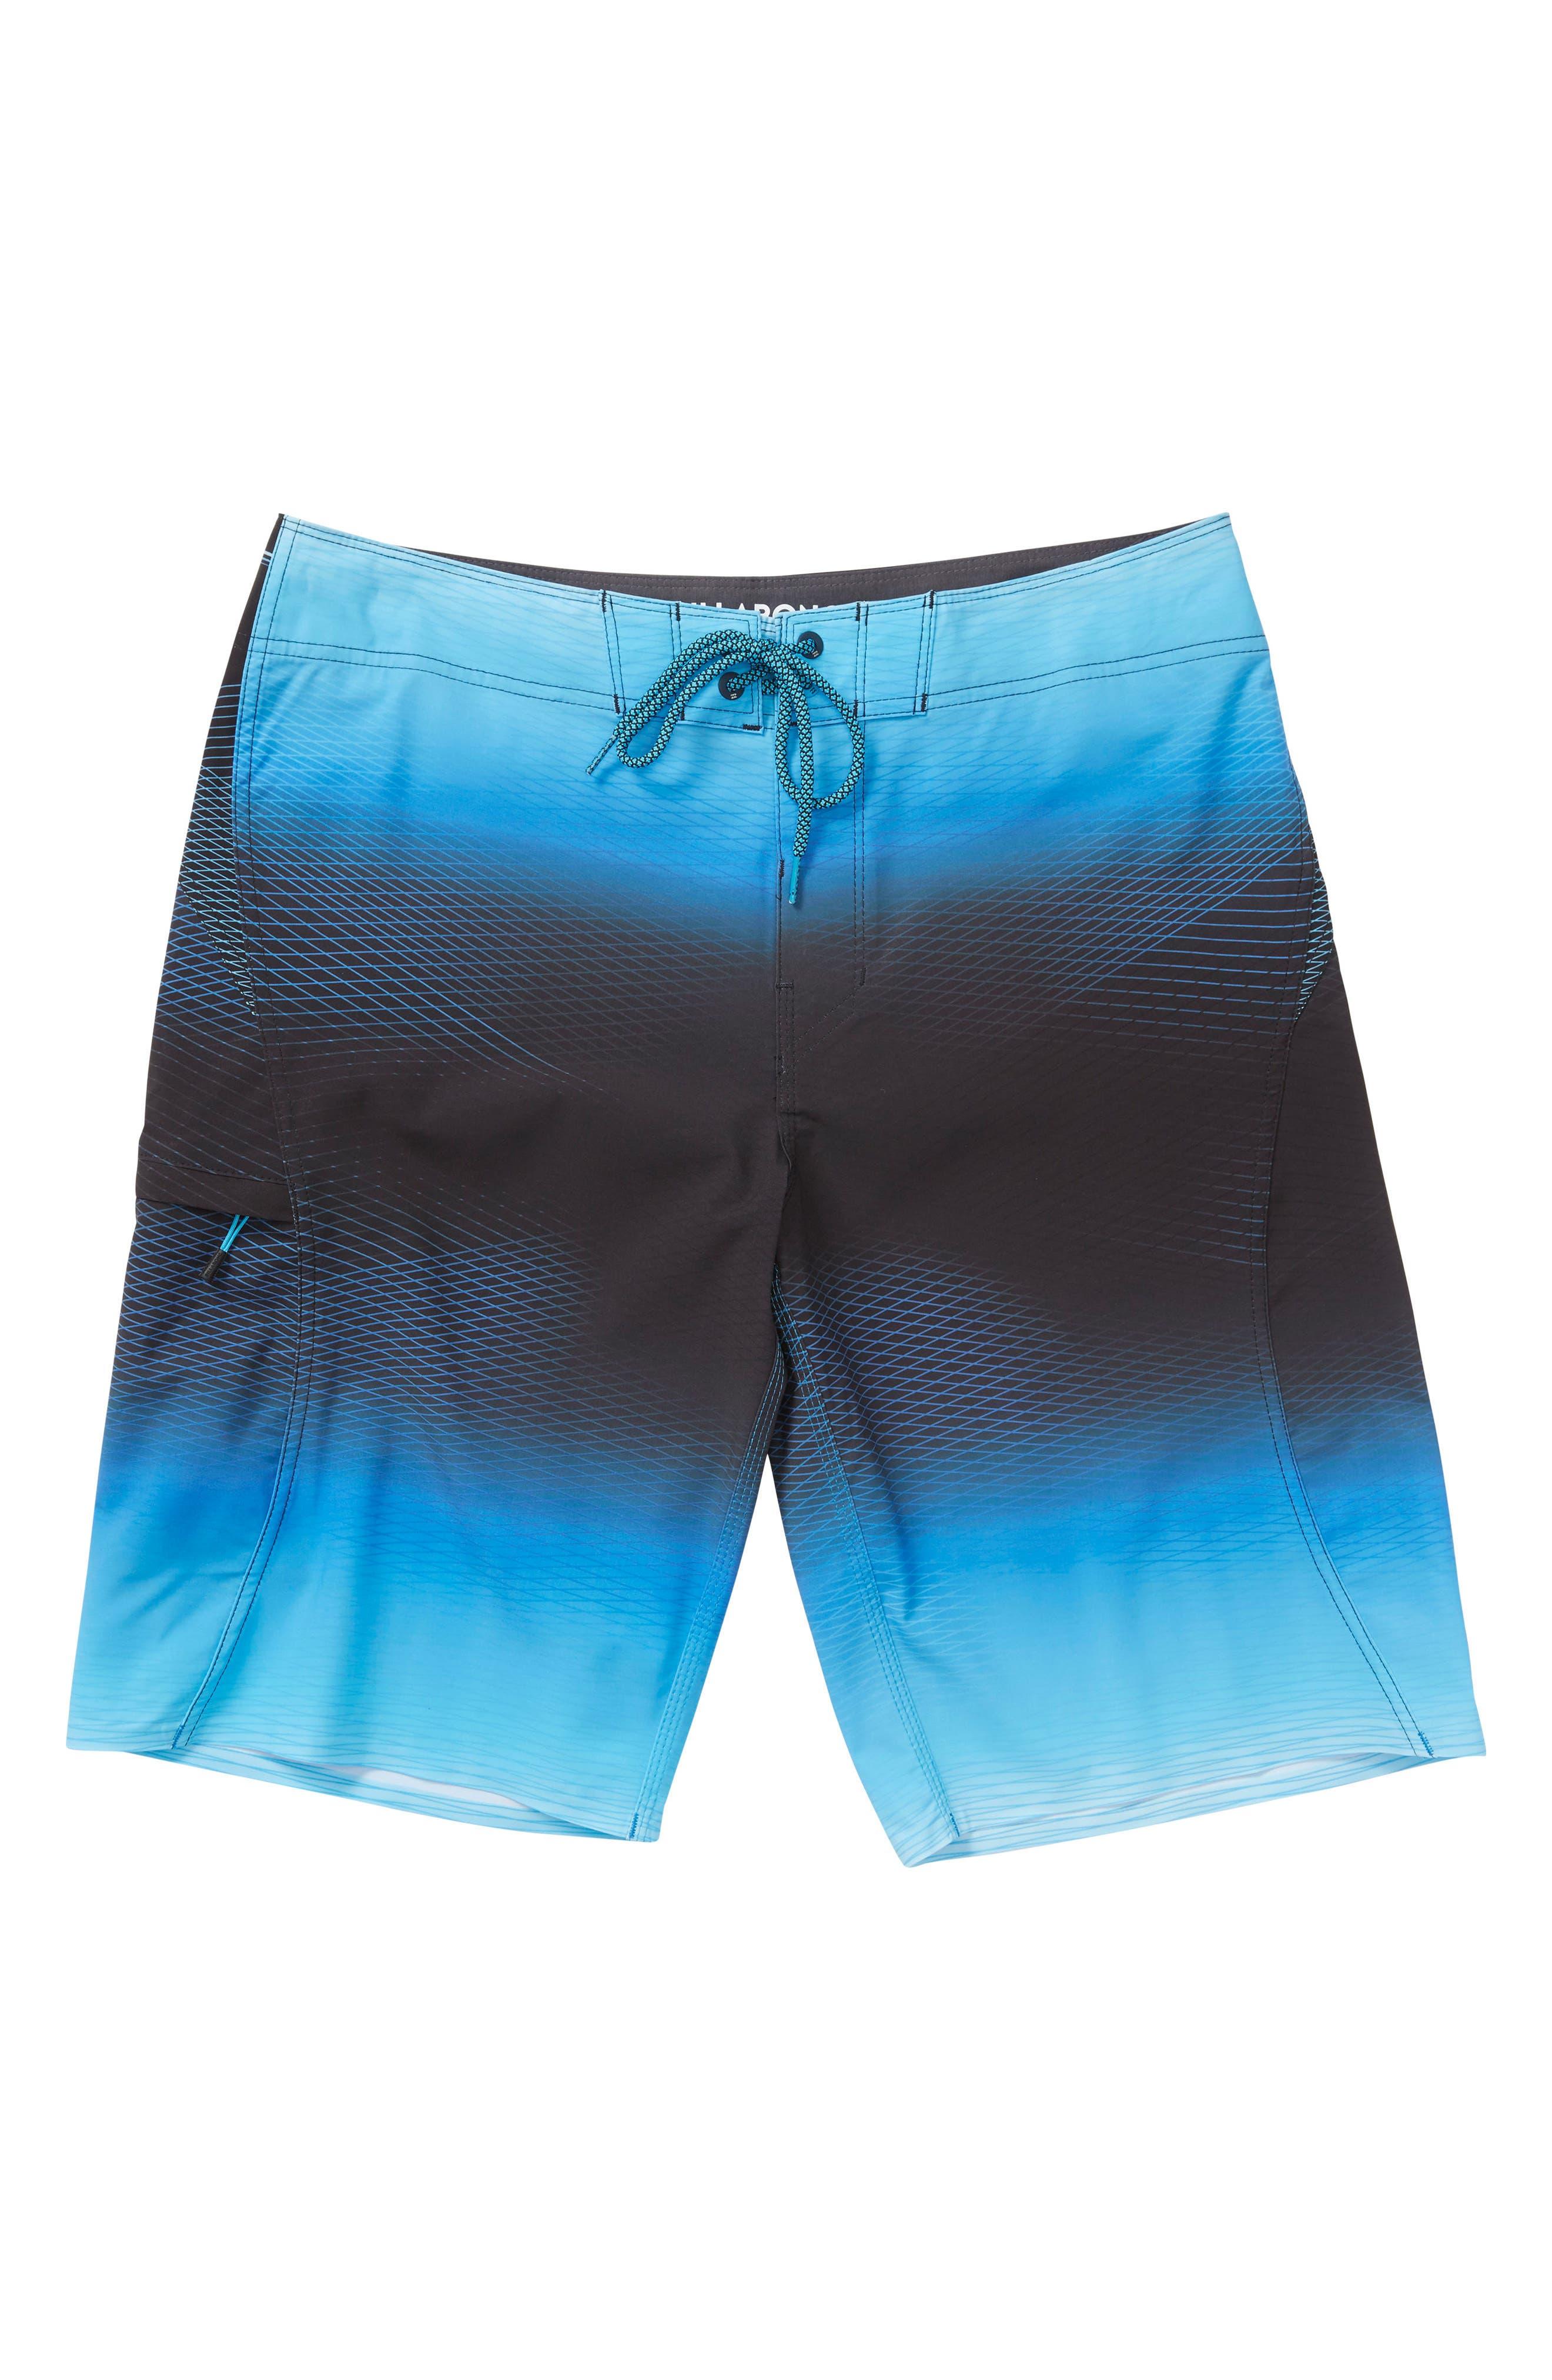 Billabong Fluid X Performance Fit Board Shorts (Big Boys)